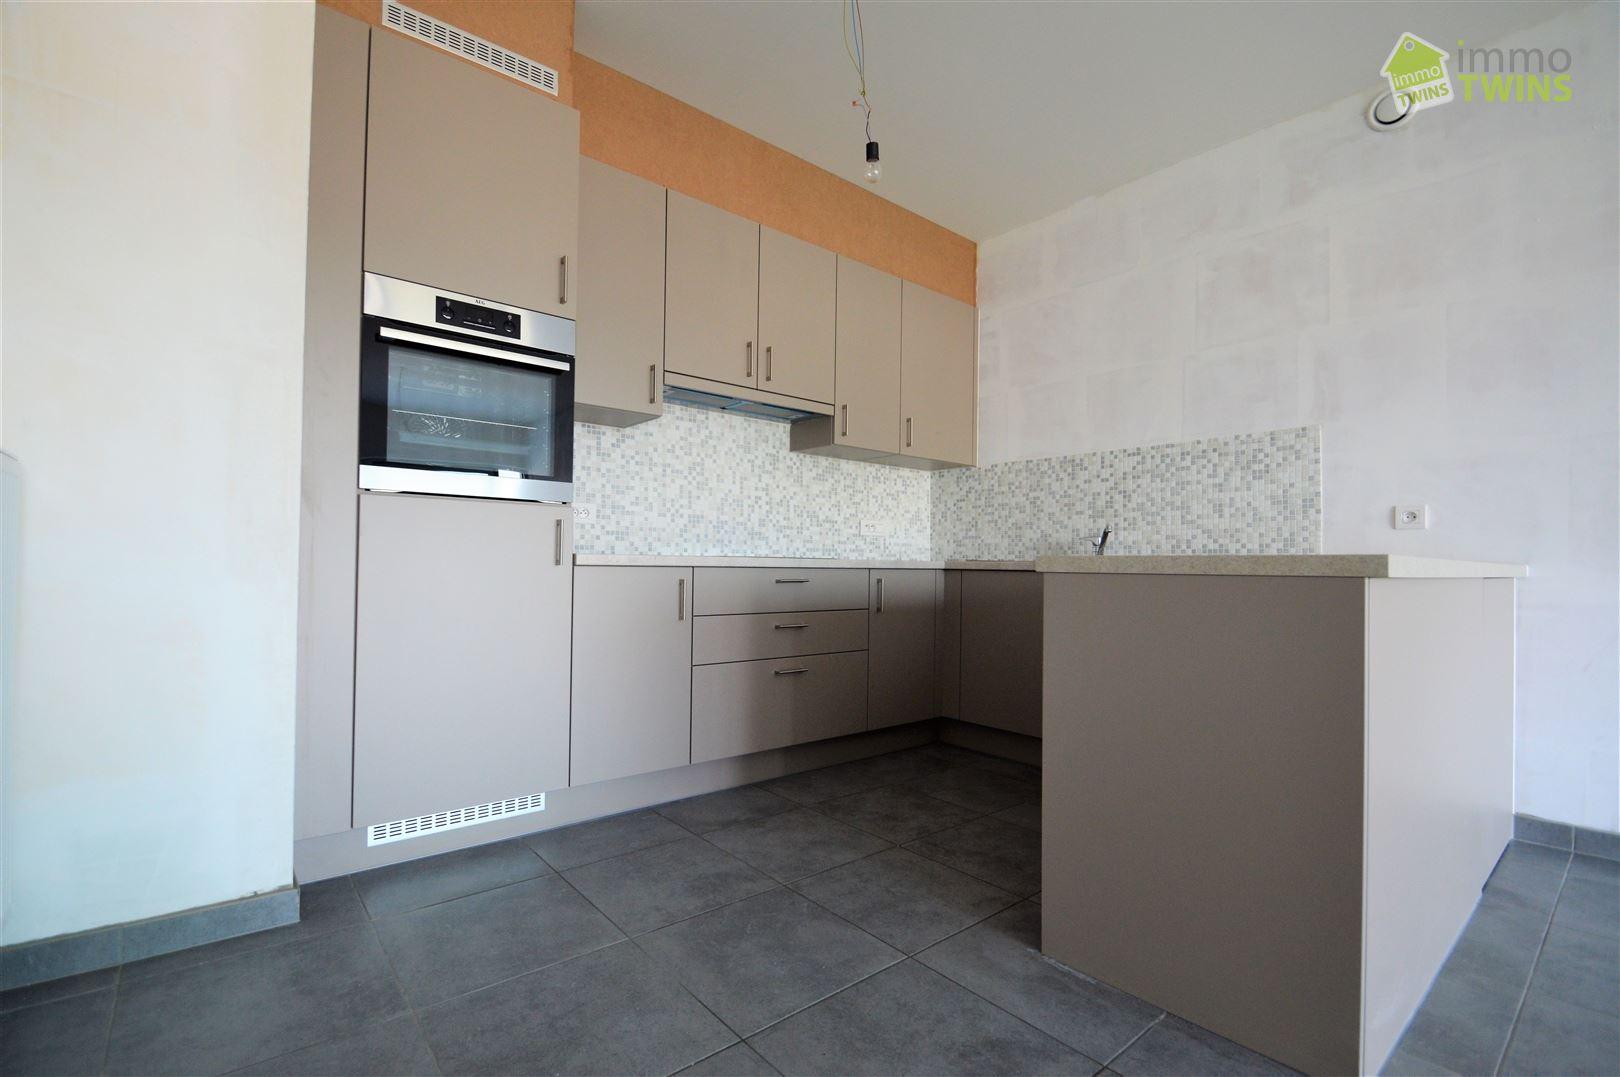 Foto 2 : Appartement te 9160 LOKEREN (België) - Prijs € 750